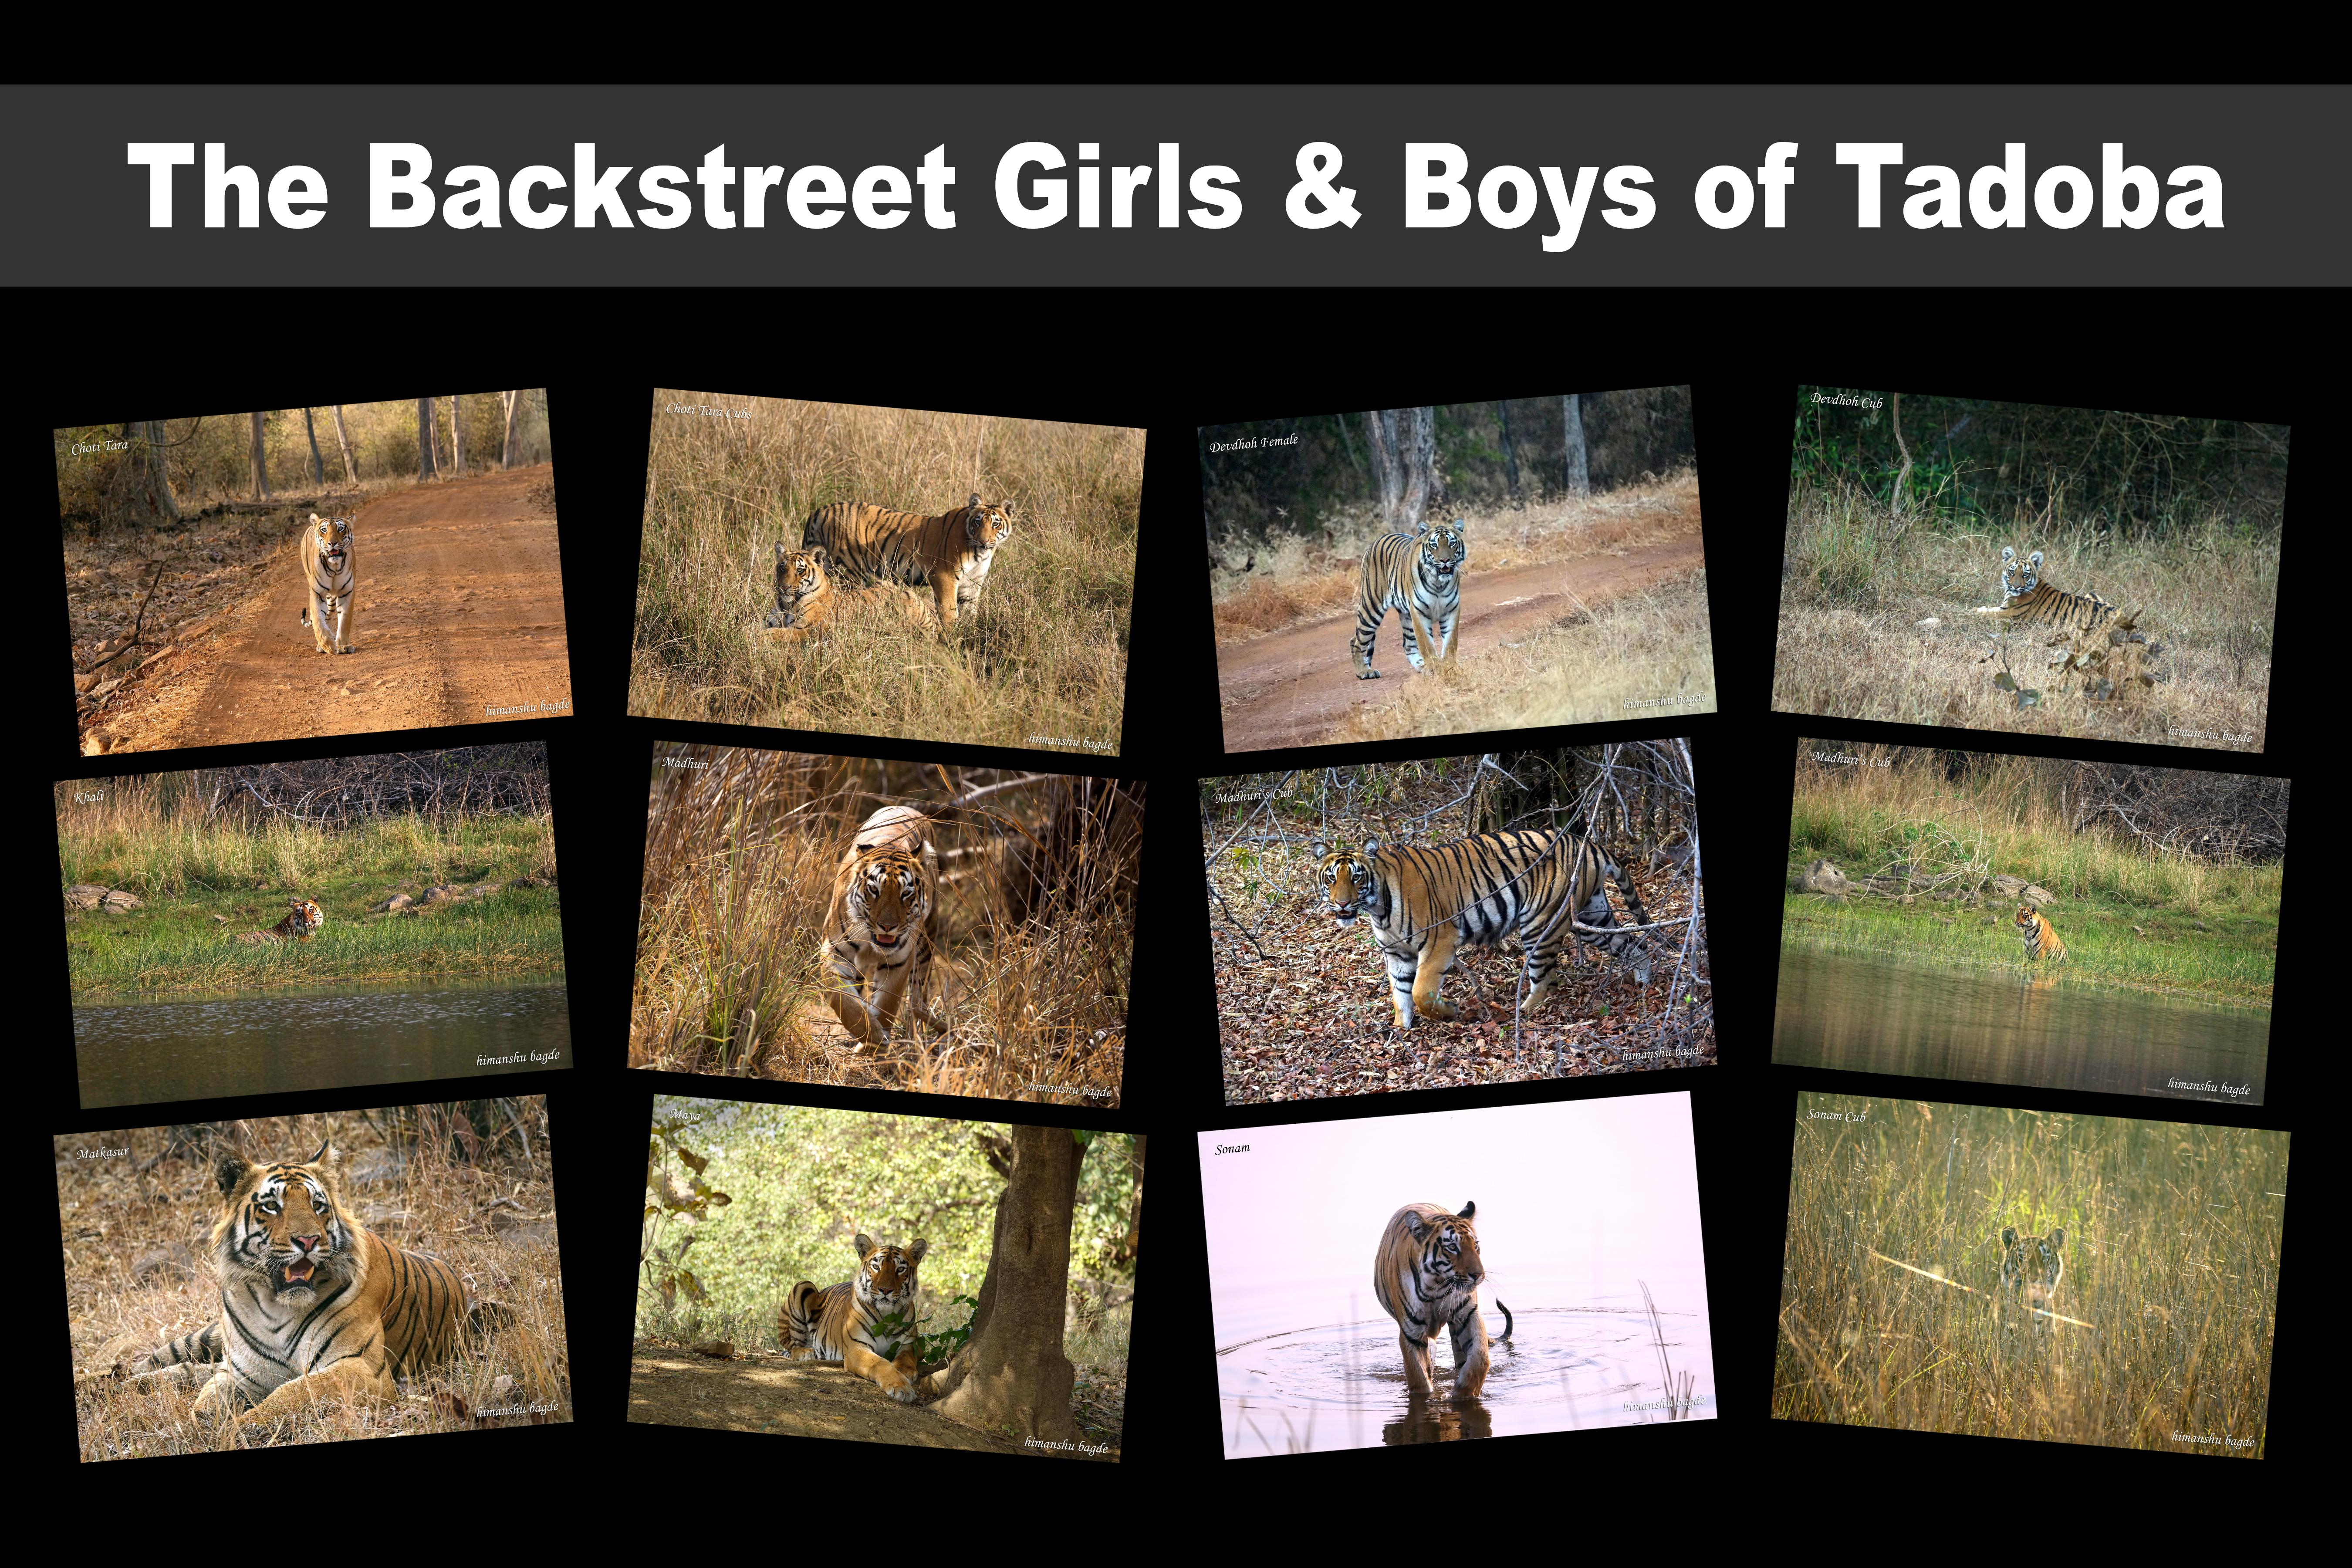 The Backstreet Girls & Boys of Tadoba